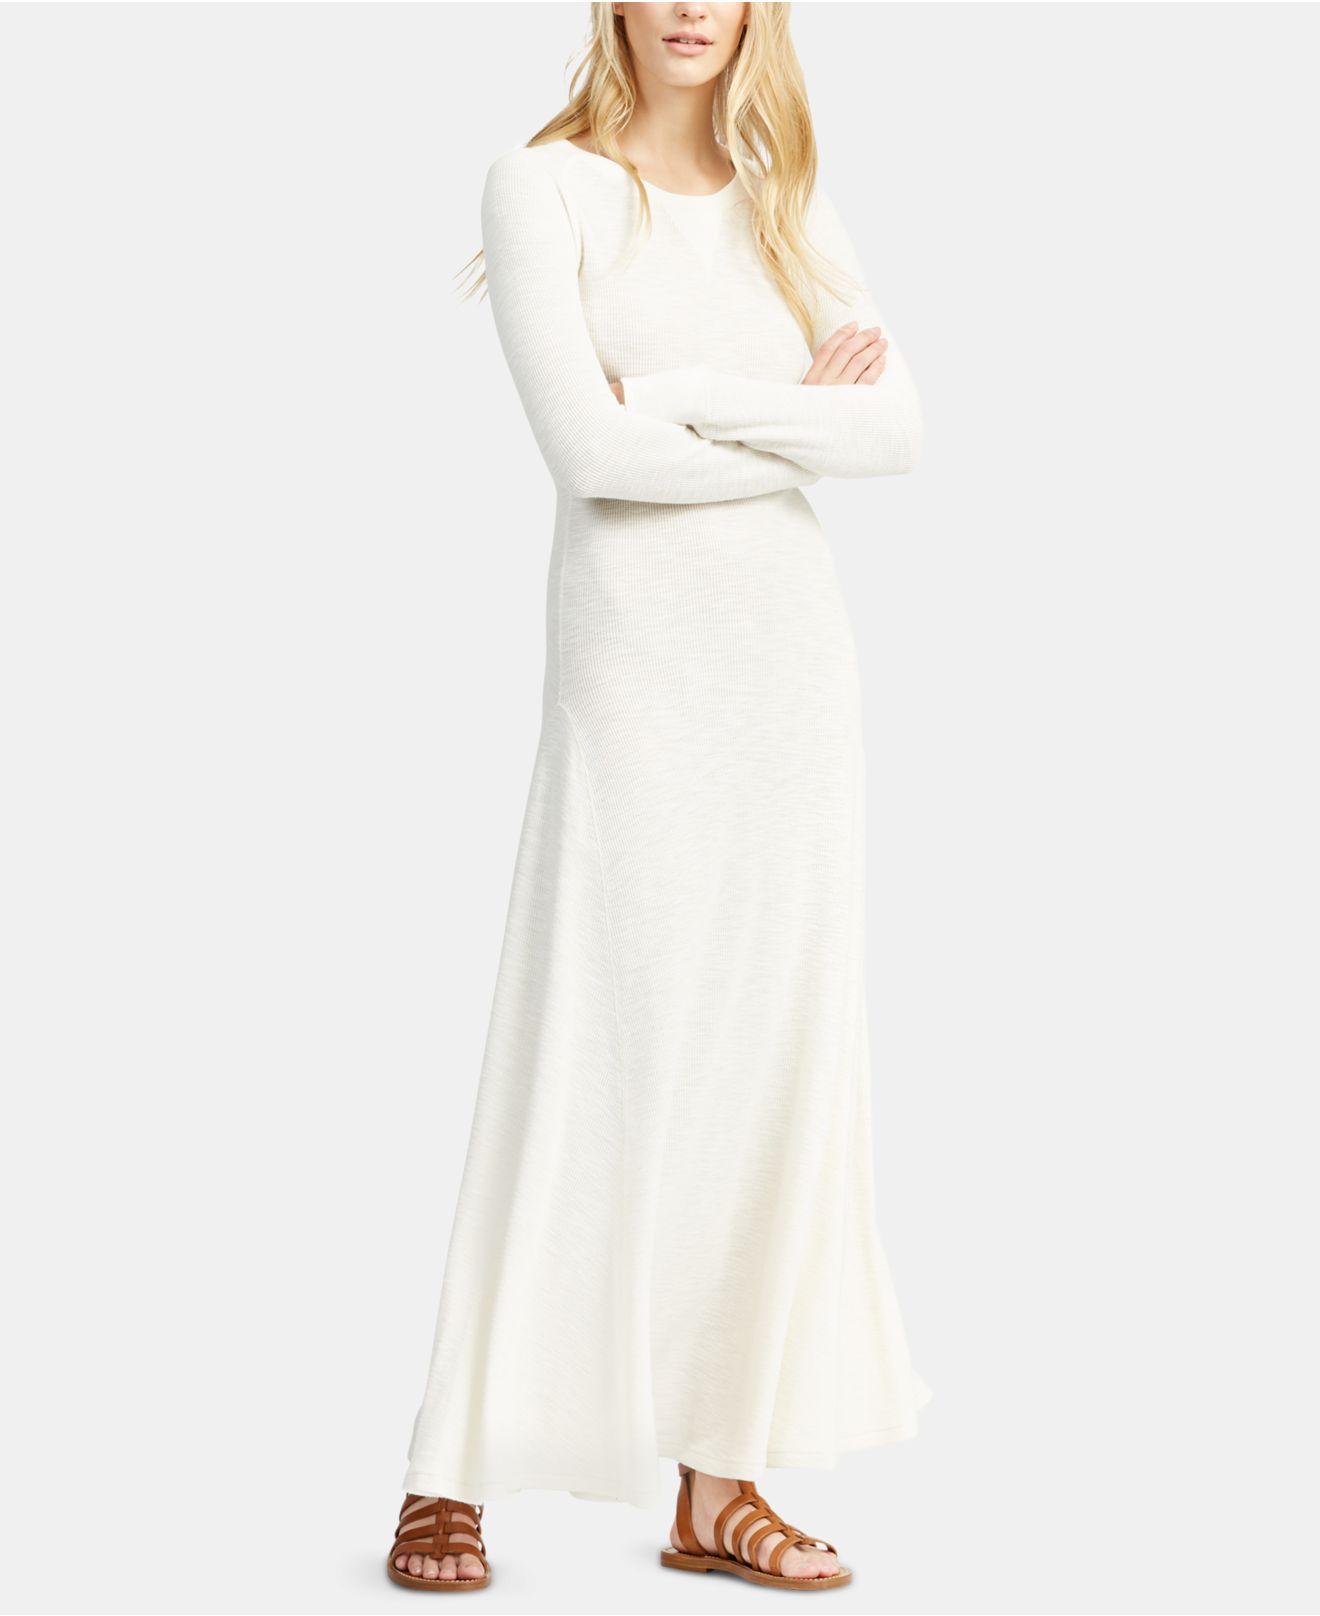 1370f2b48f Lyst - Polo Ralph Lauren Cotton Maxi Dress in White